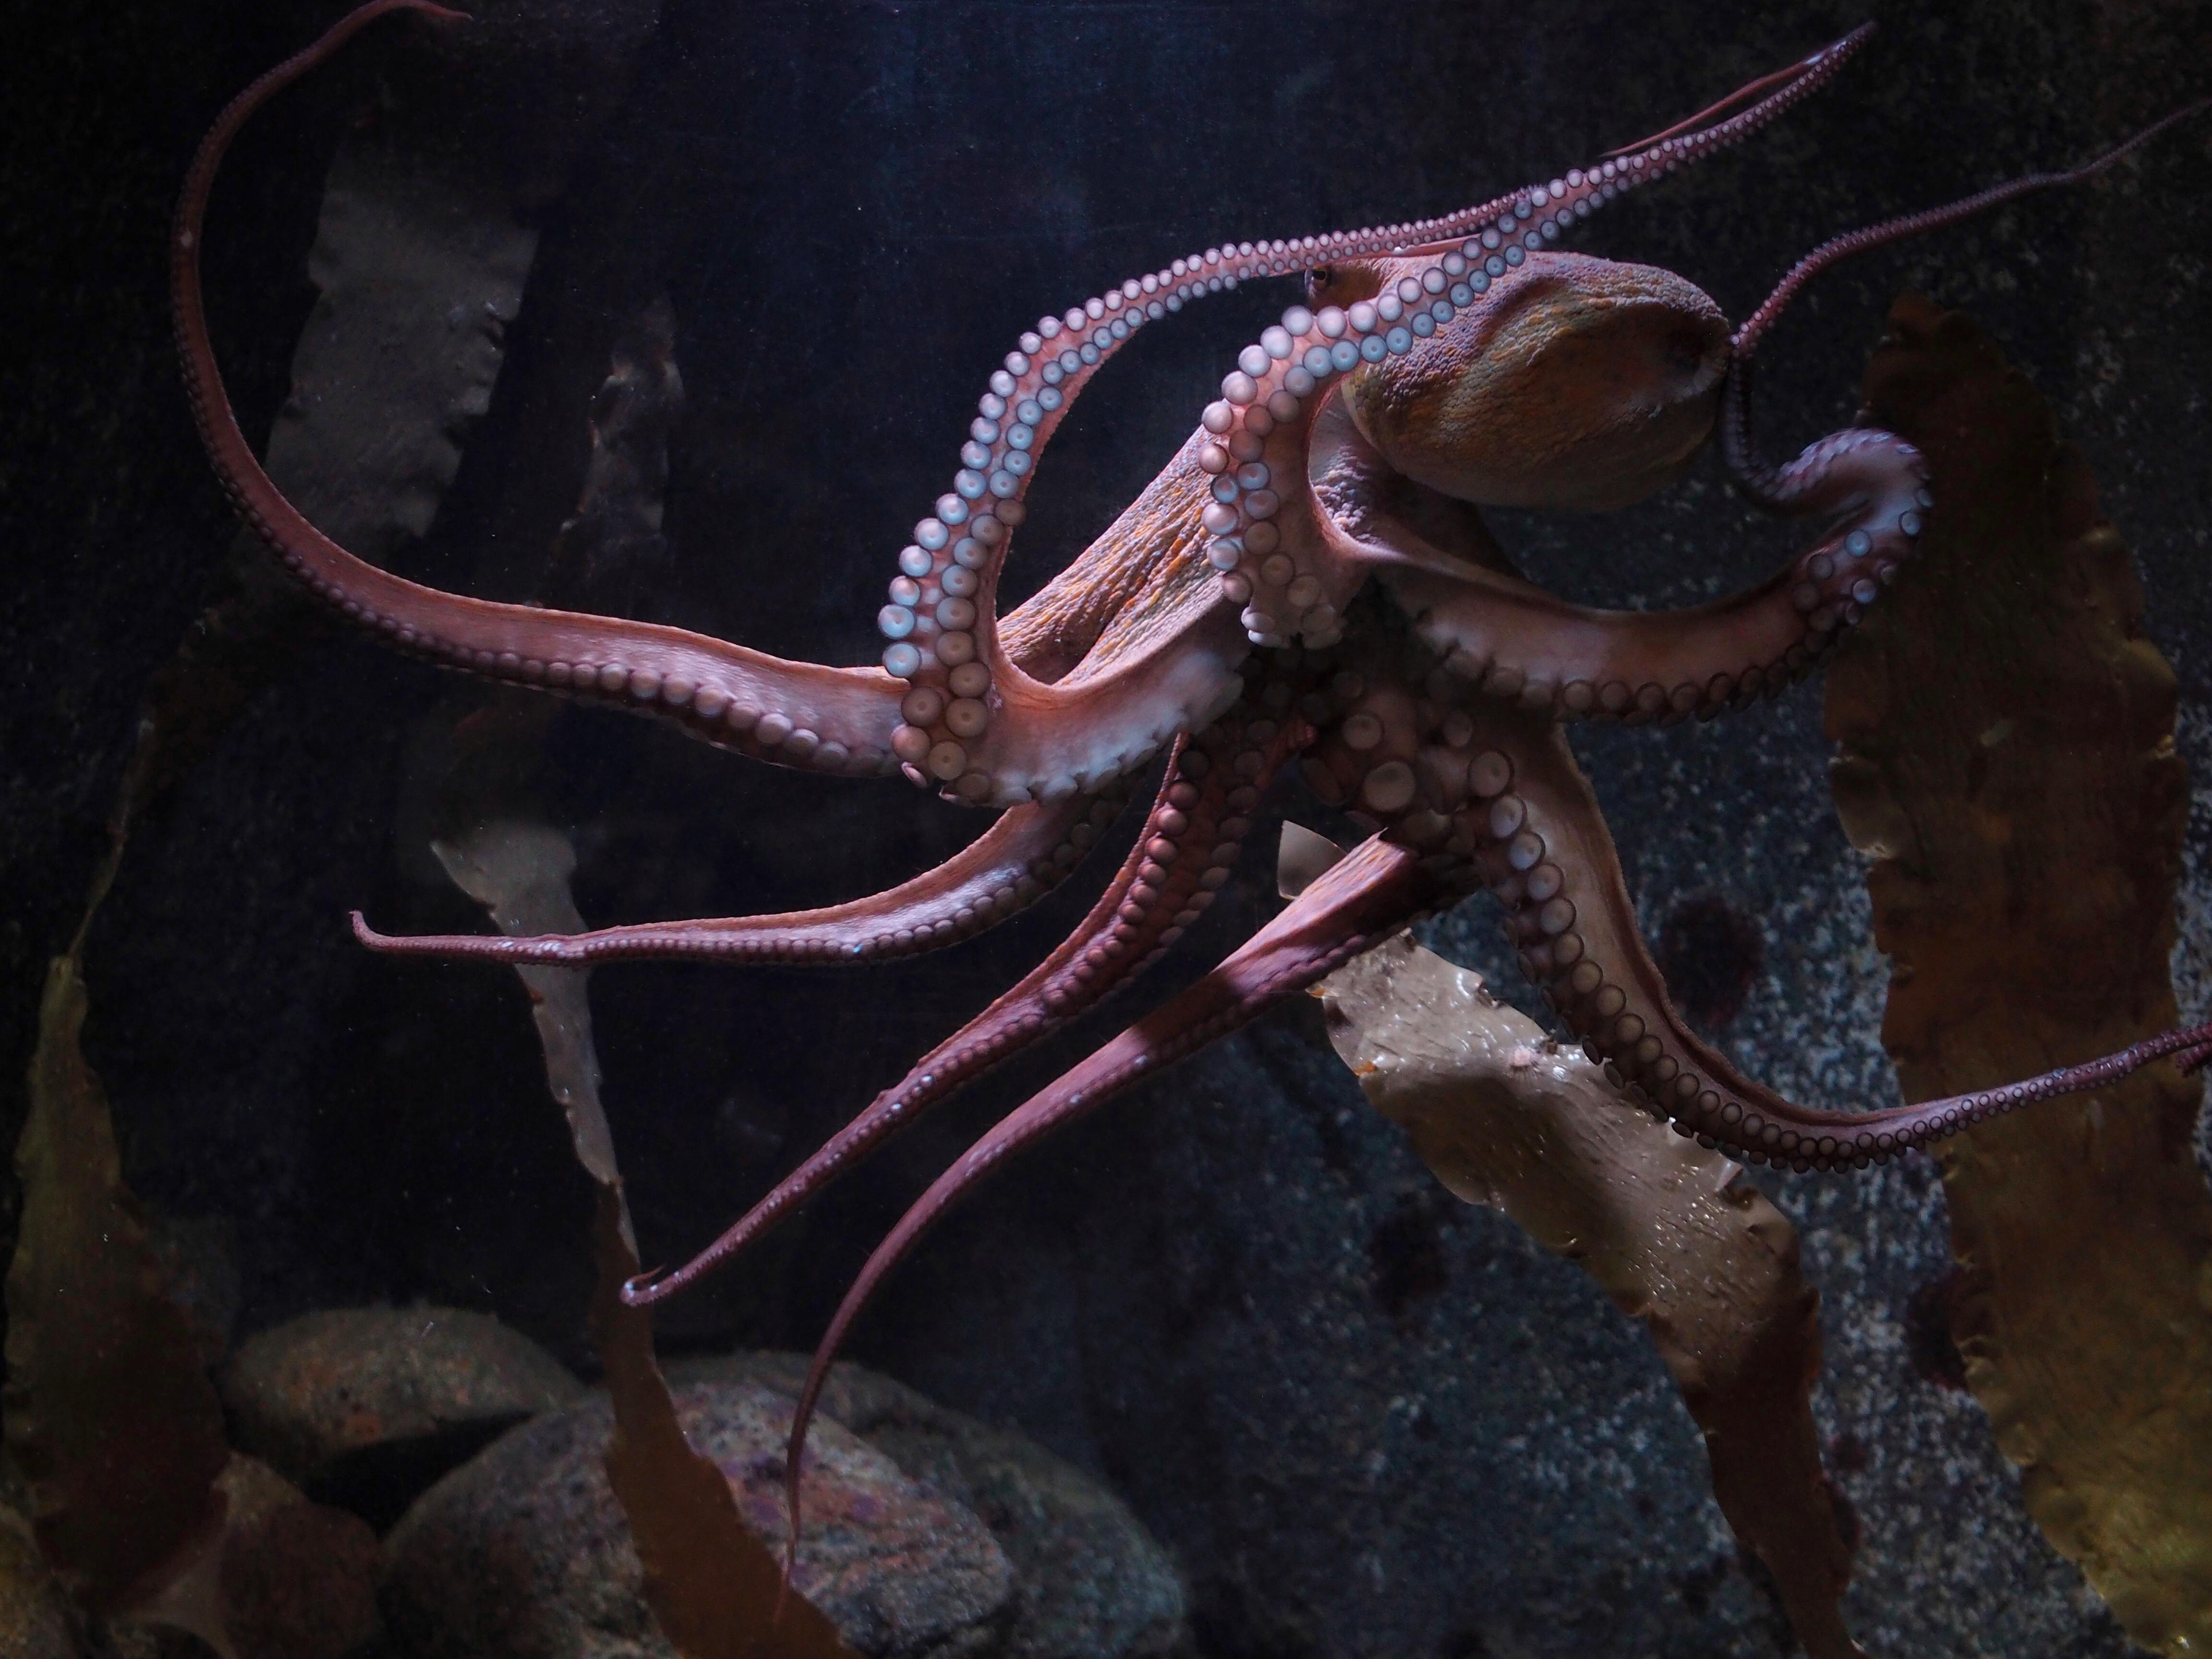 Octopus vulgaris foto Roger Jansson Havets Hus.jpg